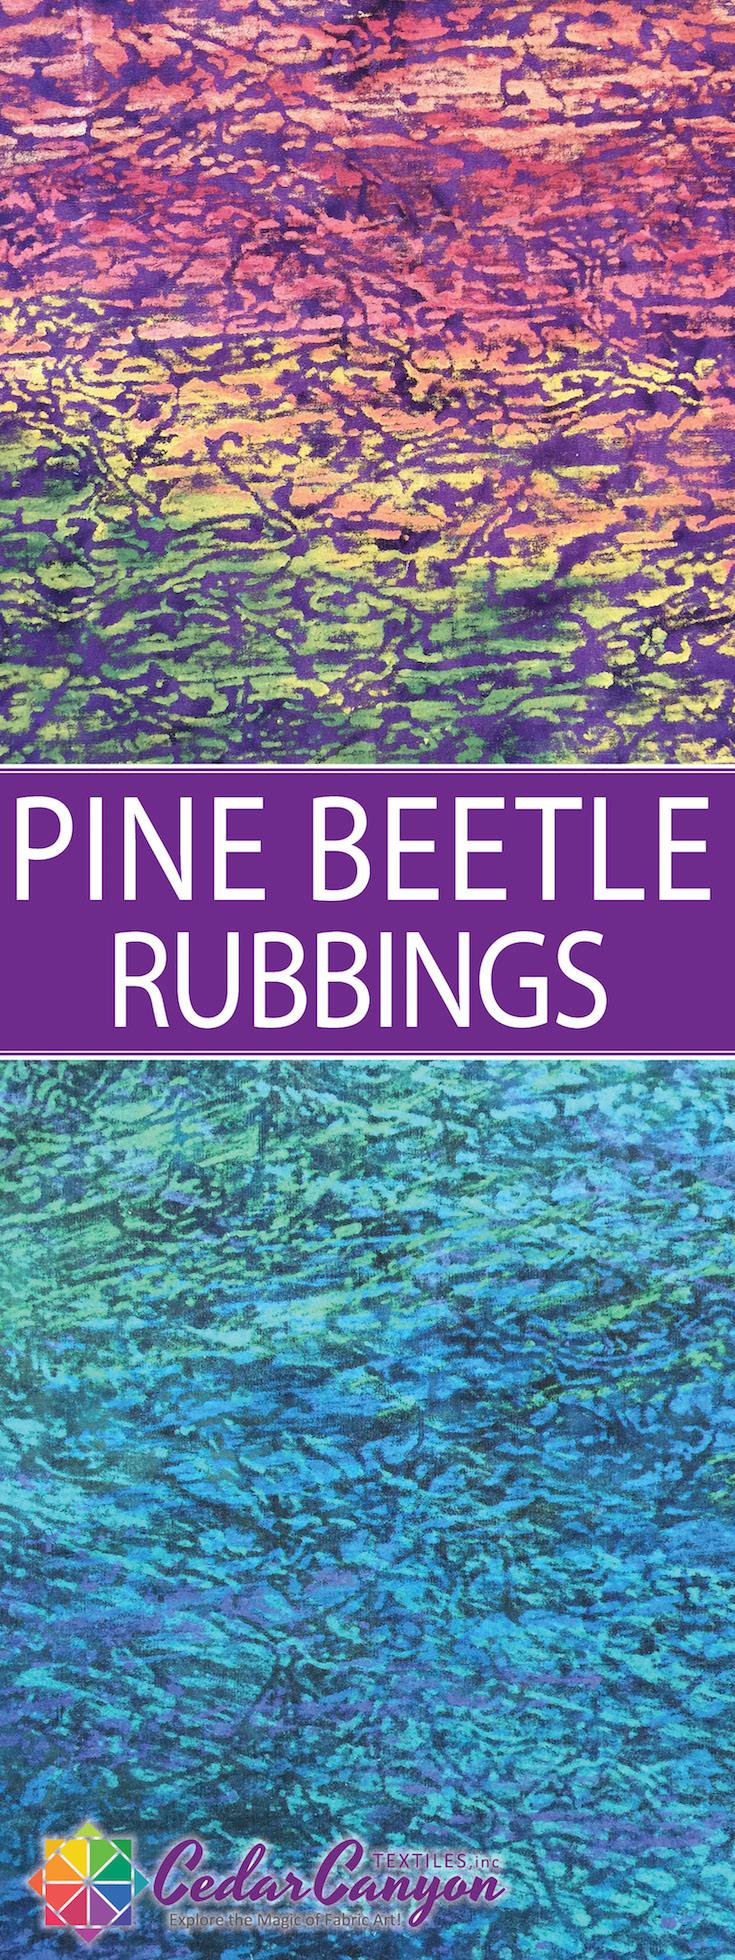 pine-beetle-rubbings-pin